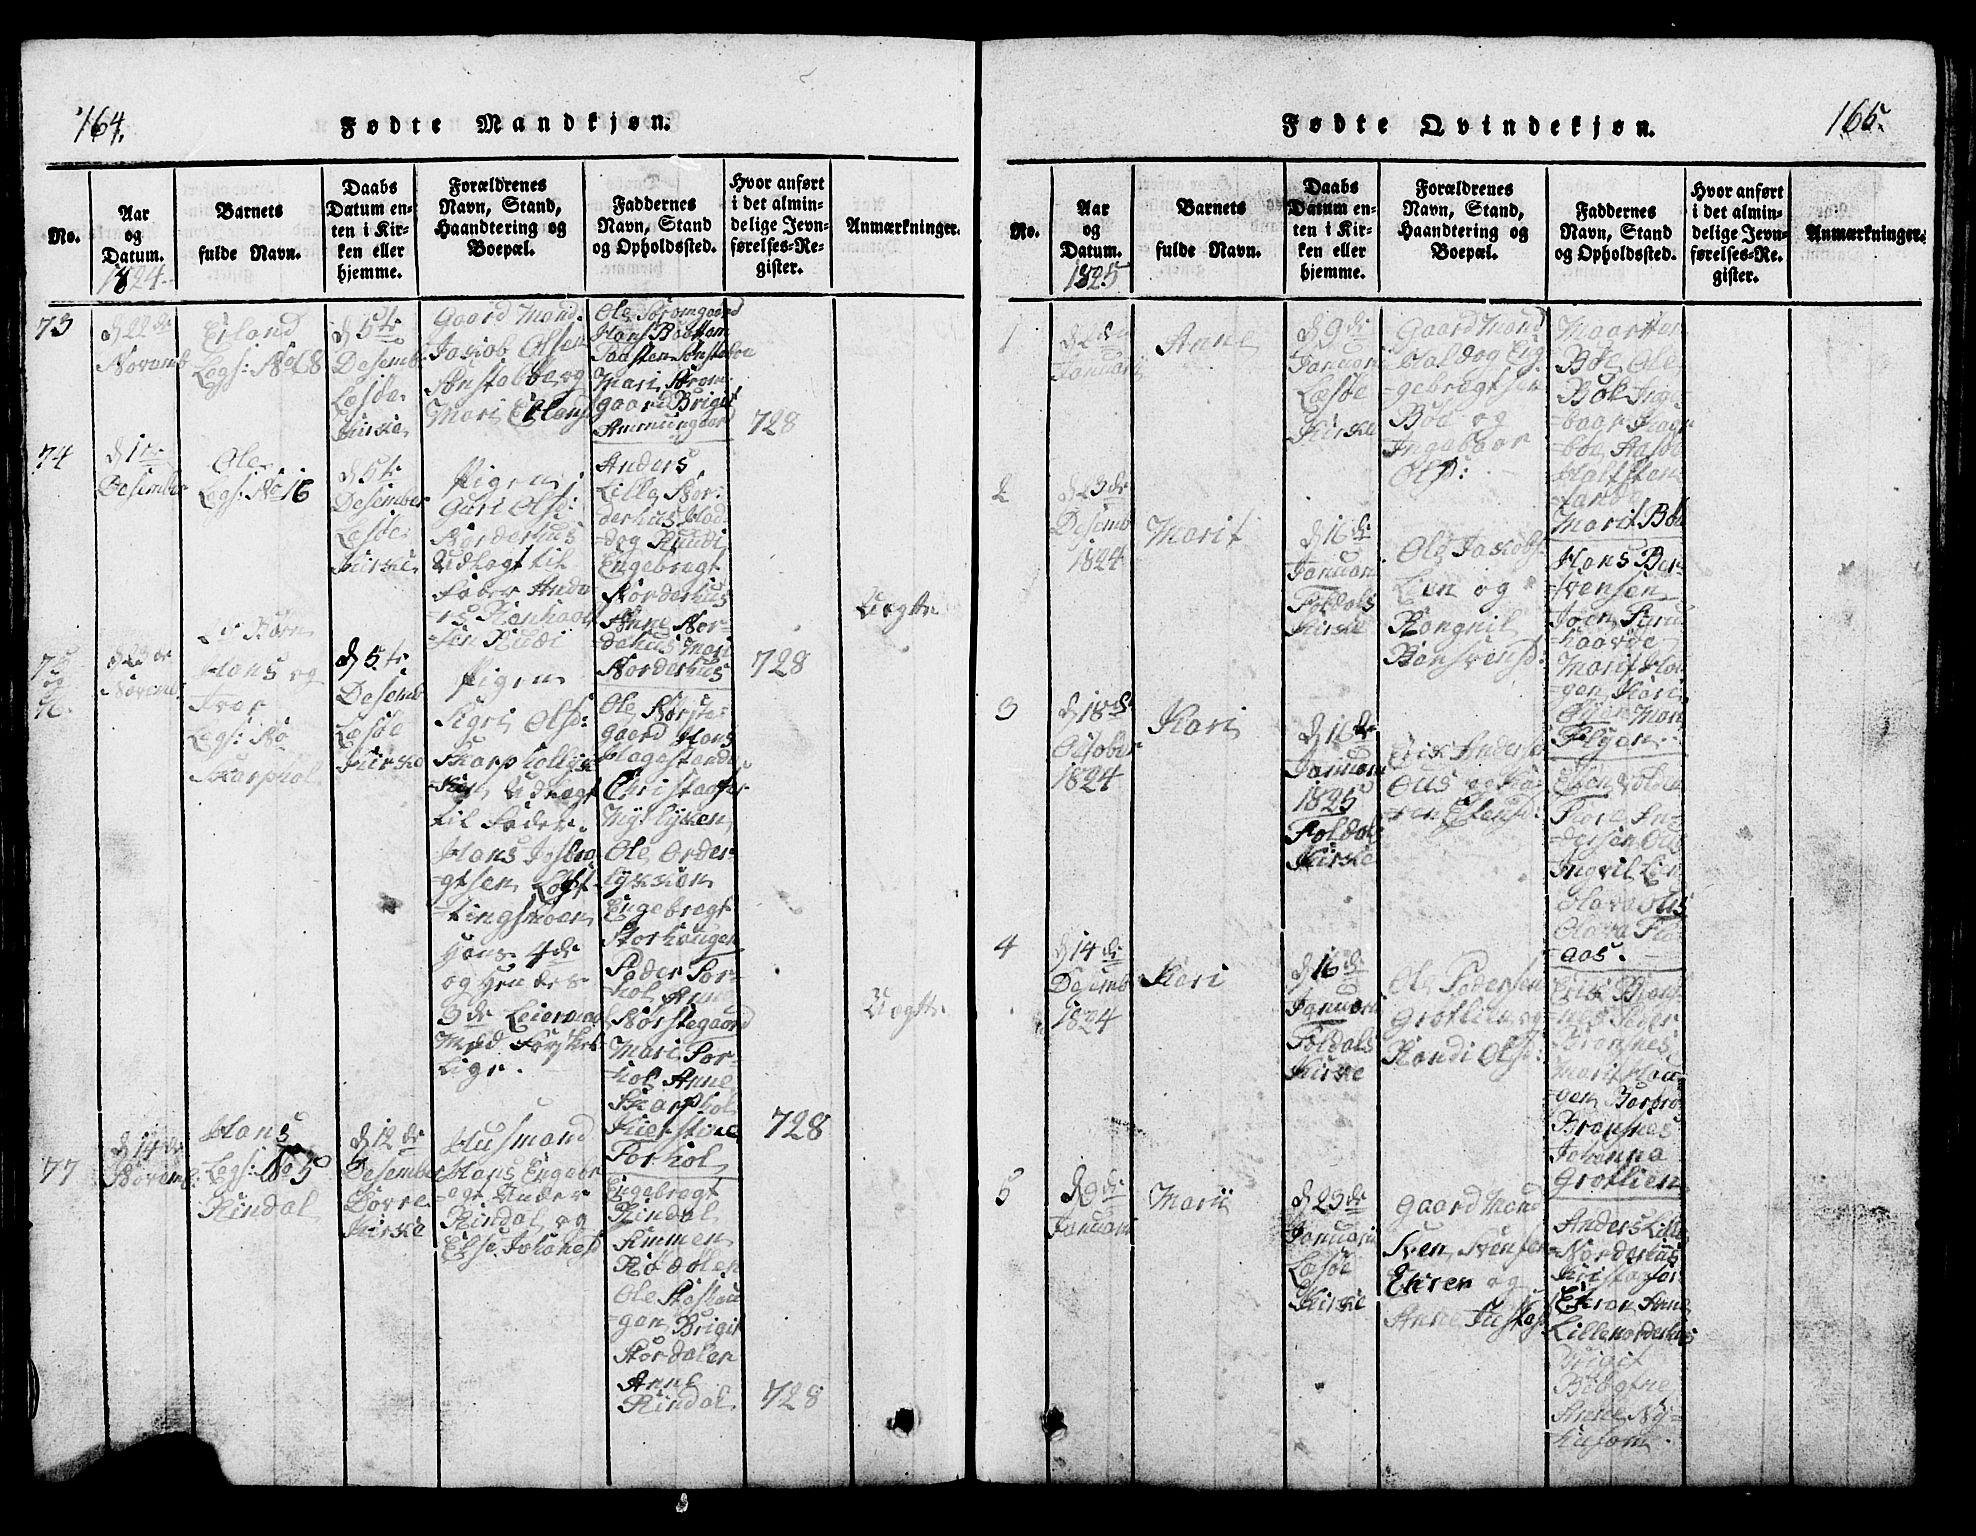 SAH, Lesja prestekontor, Klokkerbok nr. 1, 1820-1831, s. 164-165